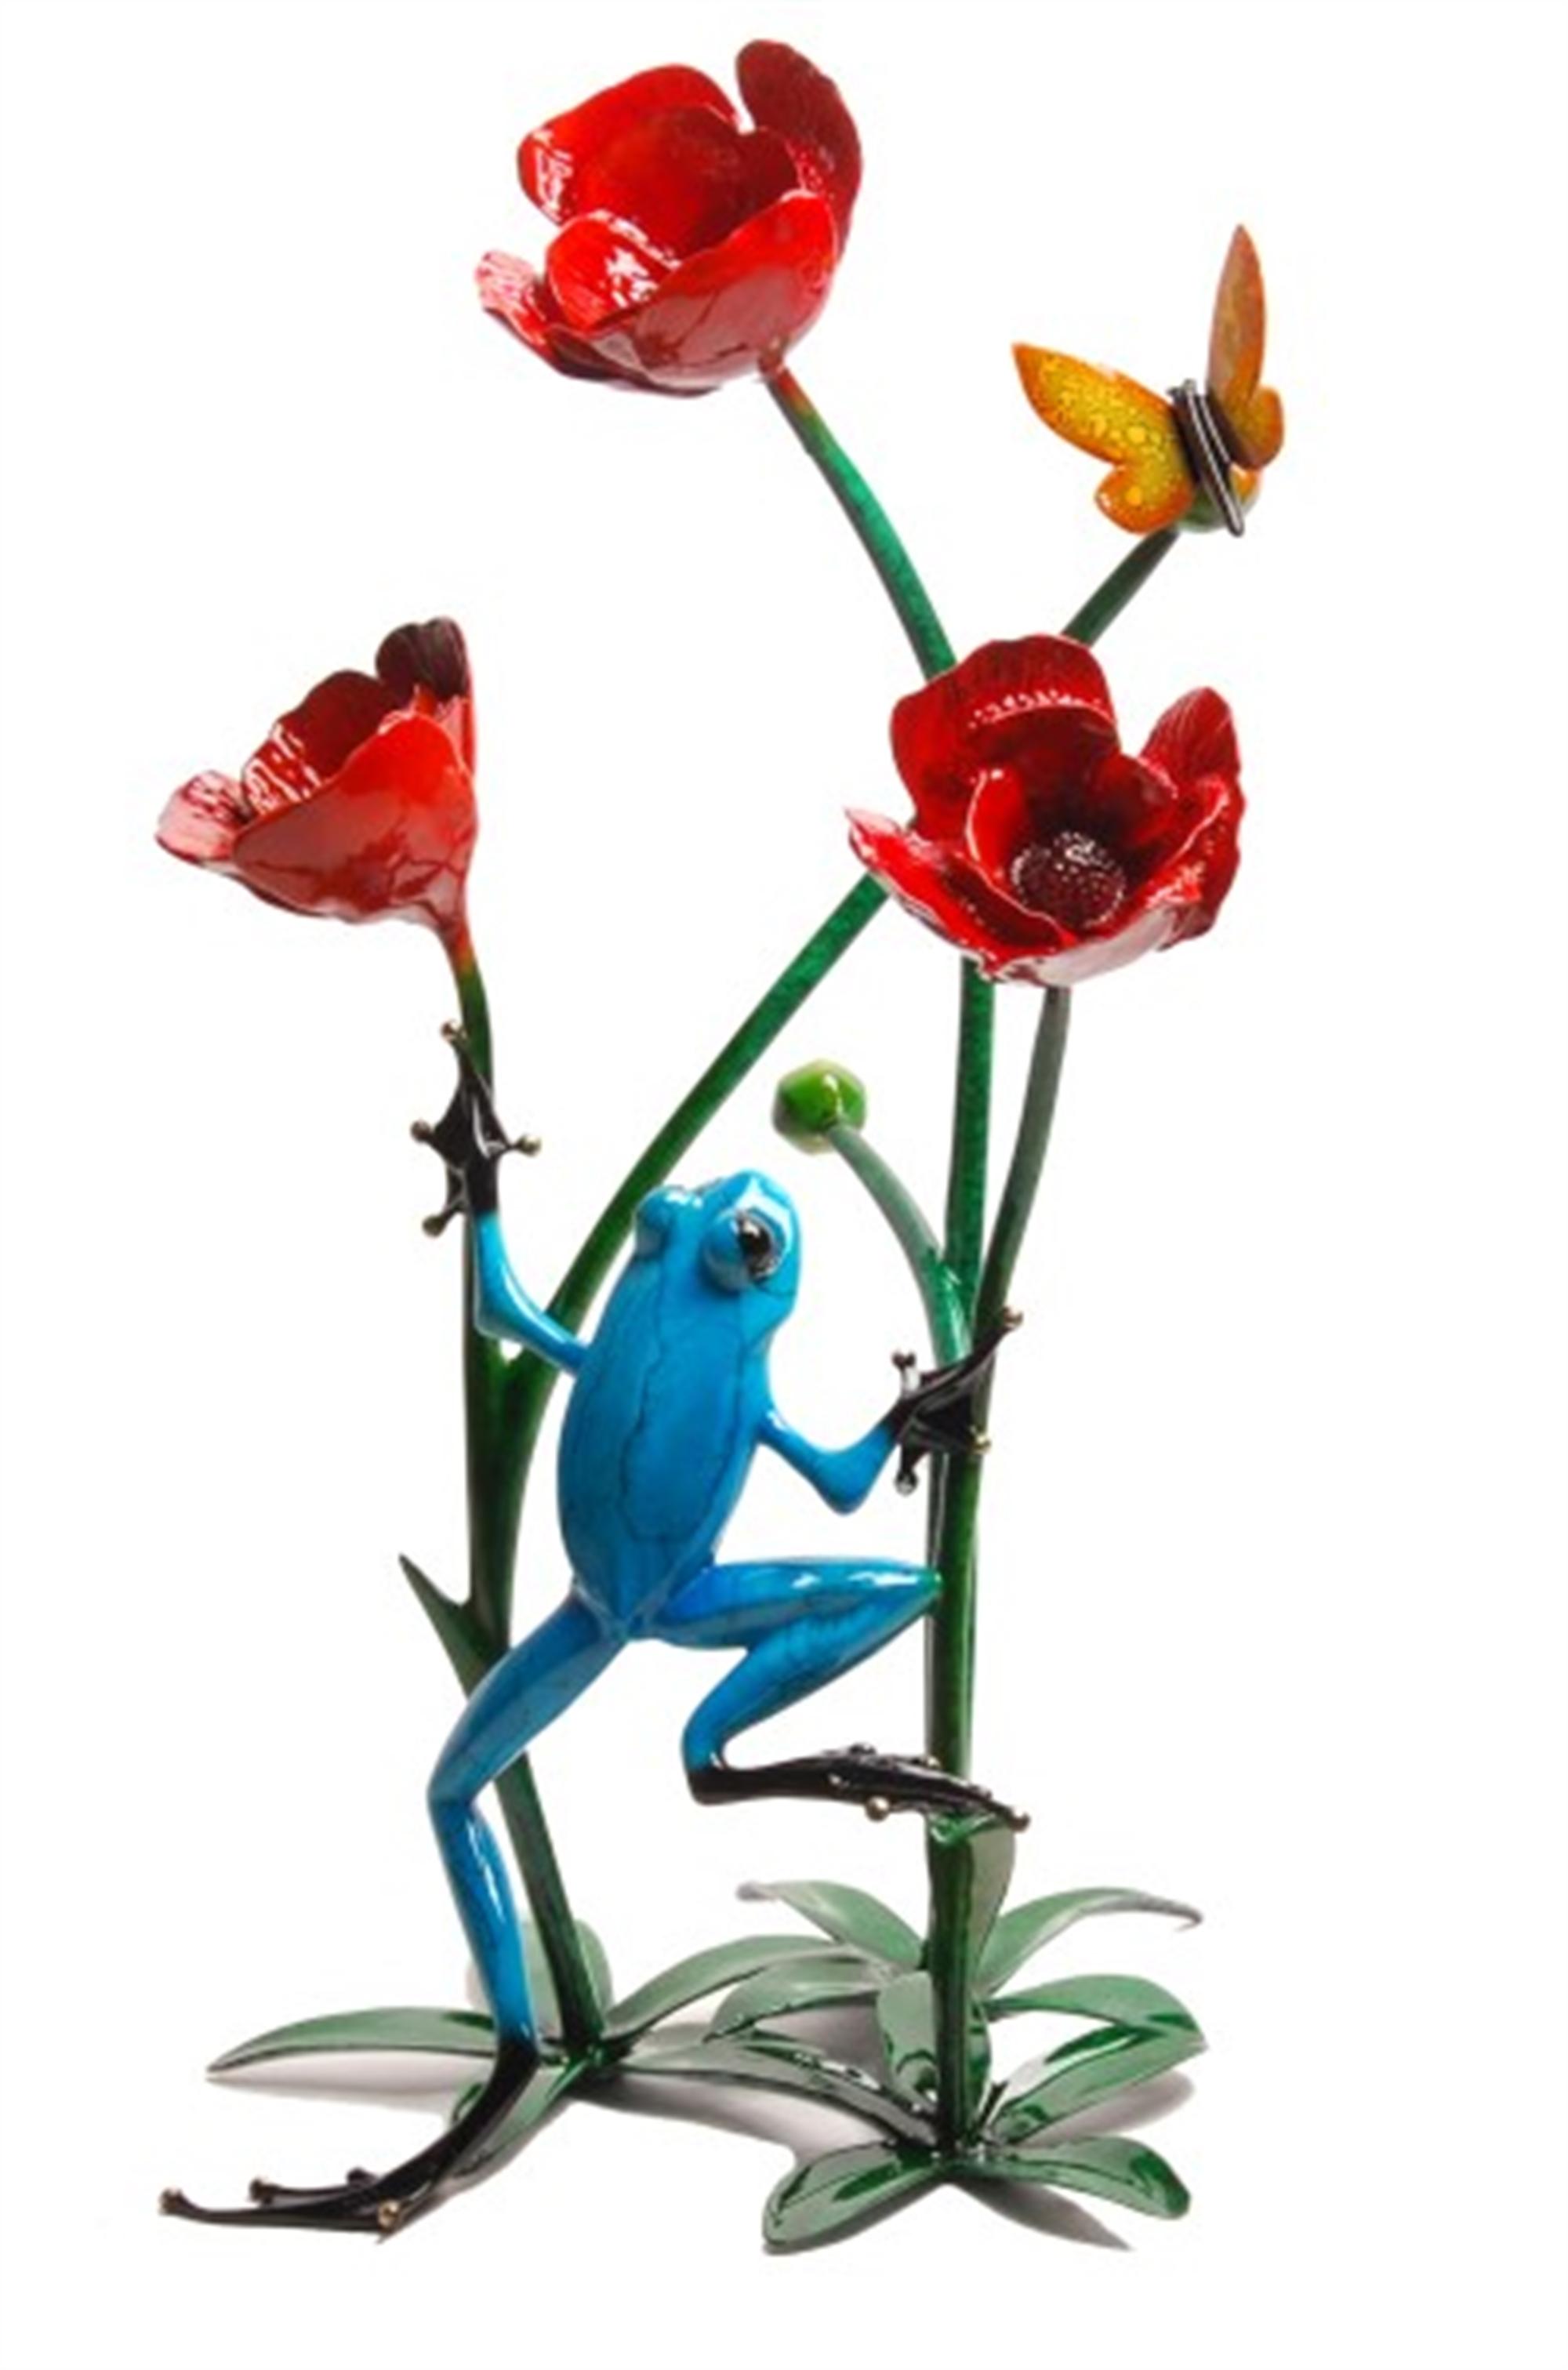 Poppy by The Frogman